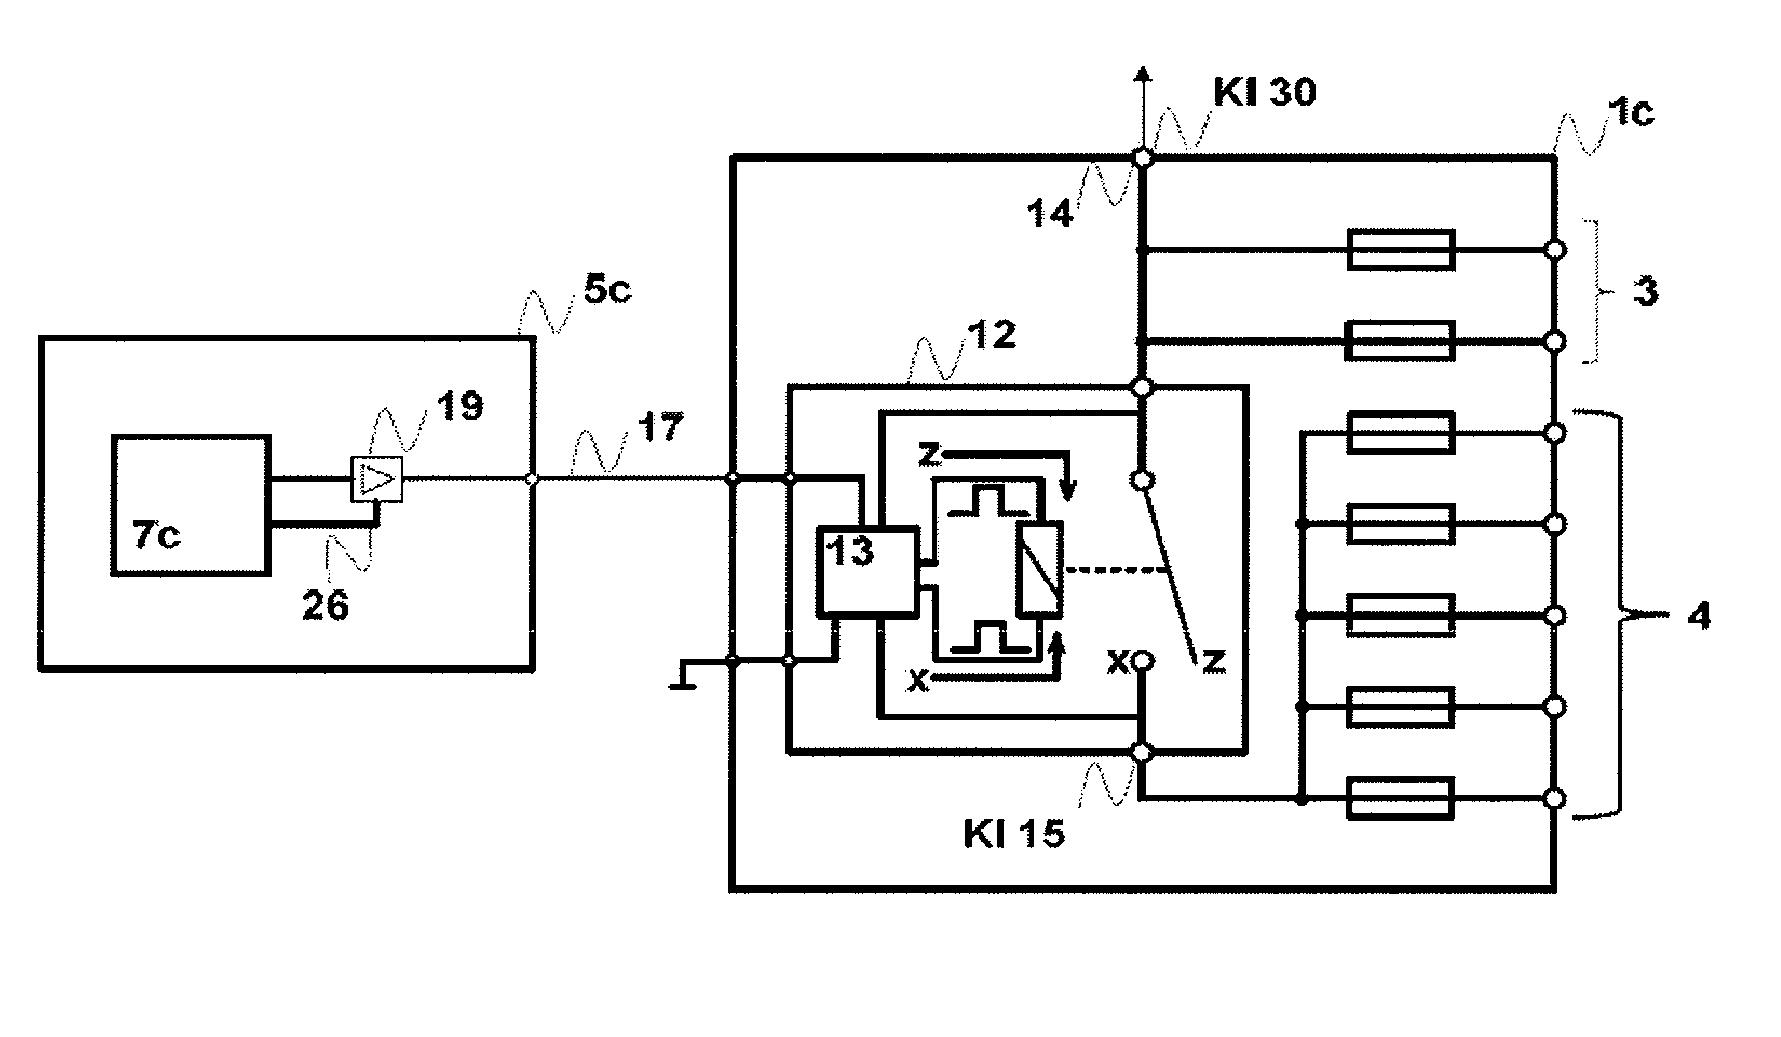 Sony Cdx L410 Wiring Diagram Tilt Trim Gauge Wiring Diagram